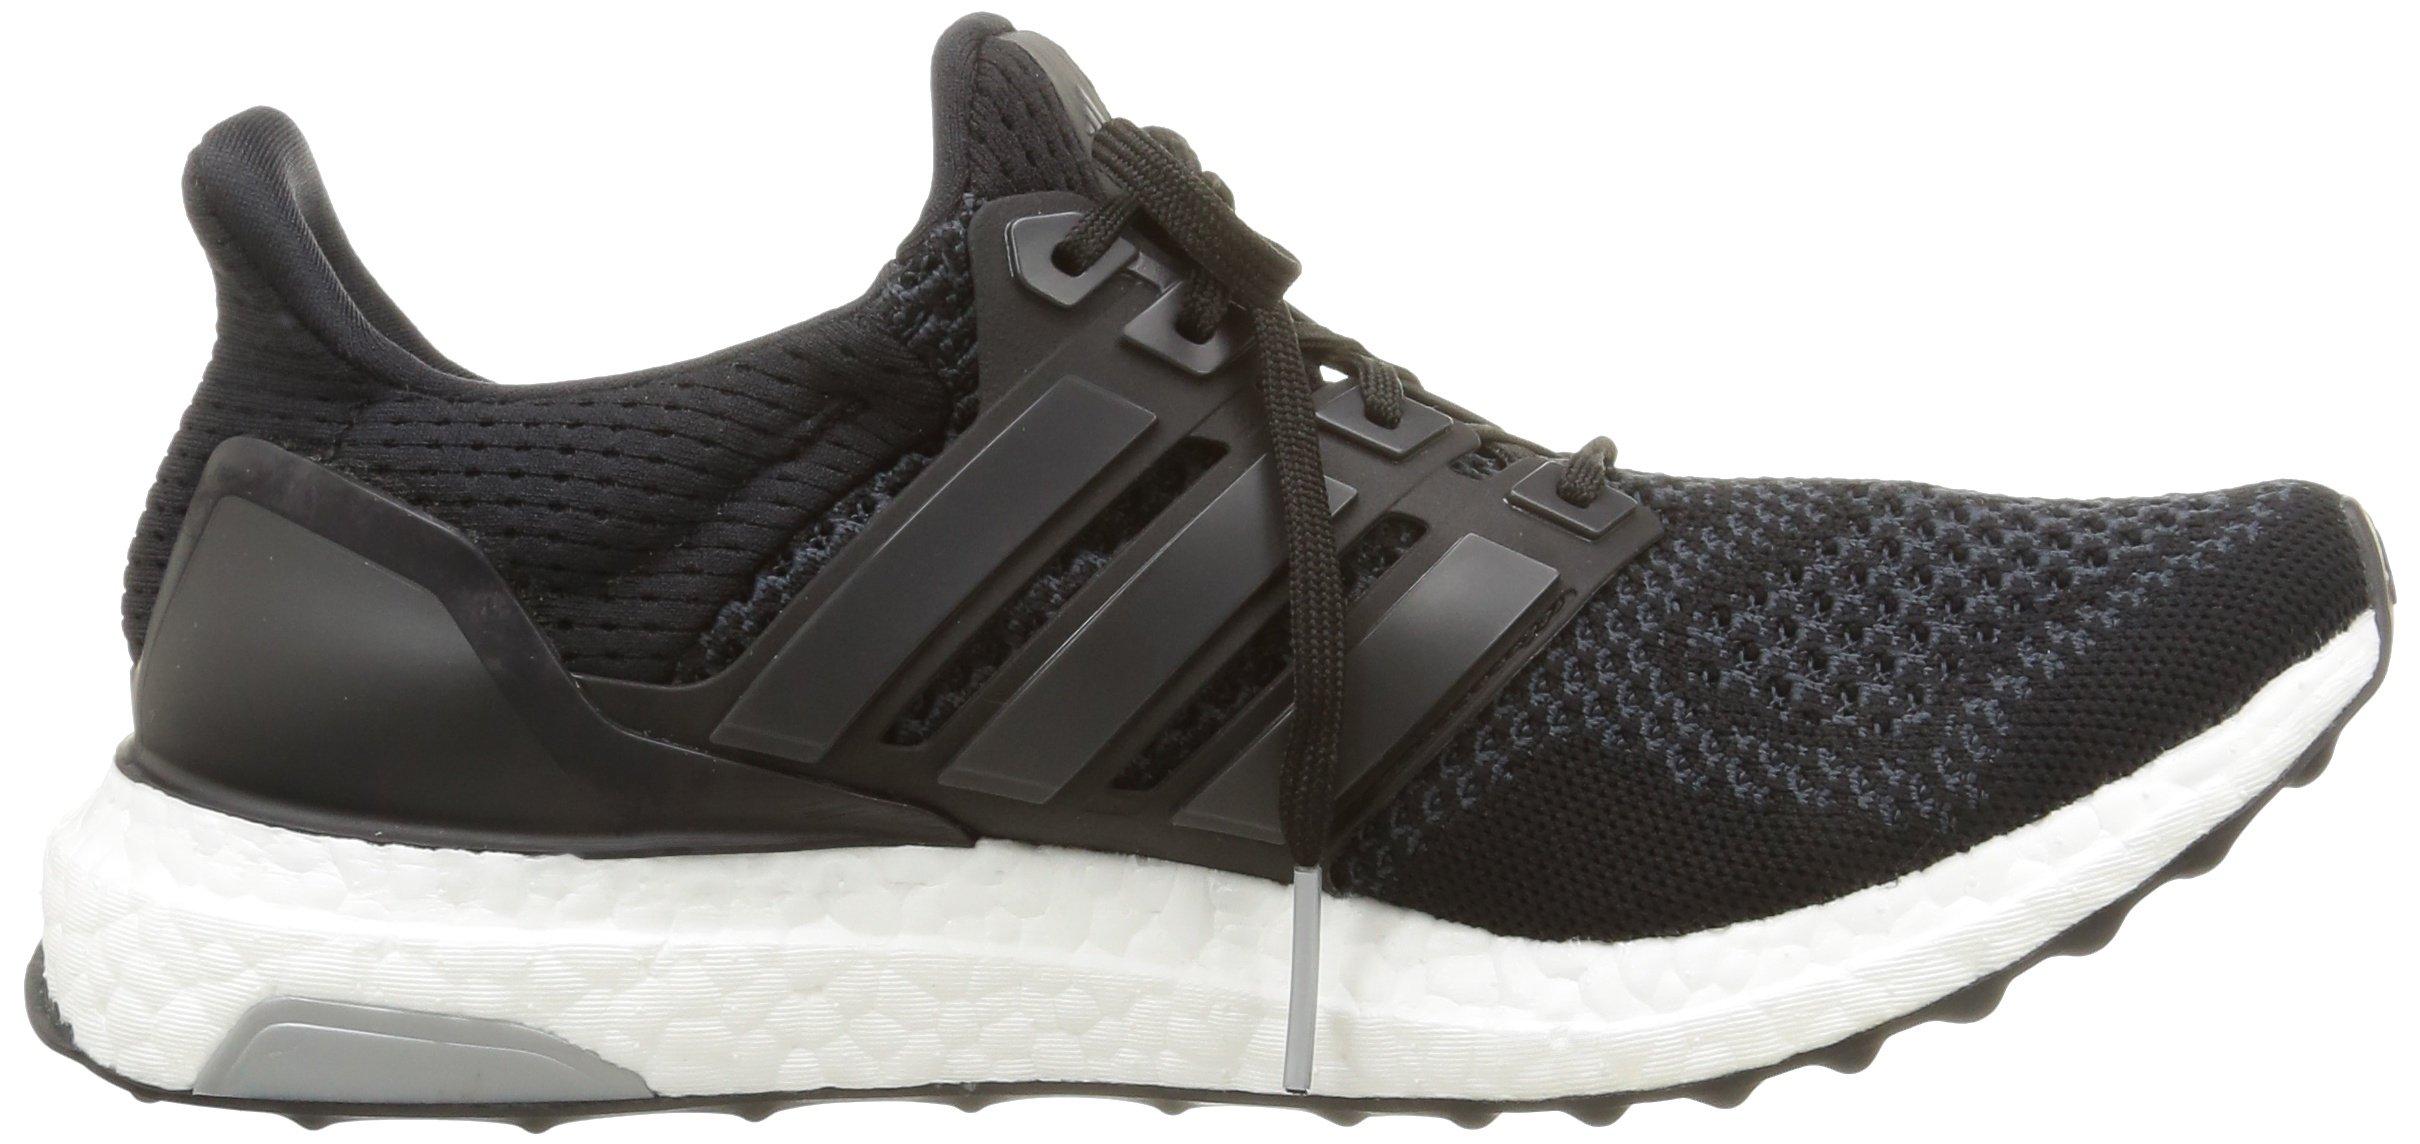 715pBlAqo5L - adidas Ultra Boost, Women's Running Shoes